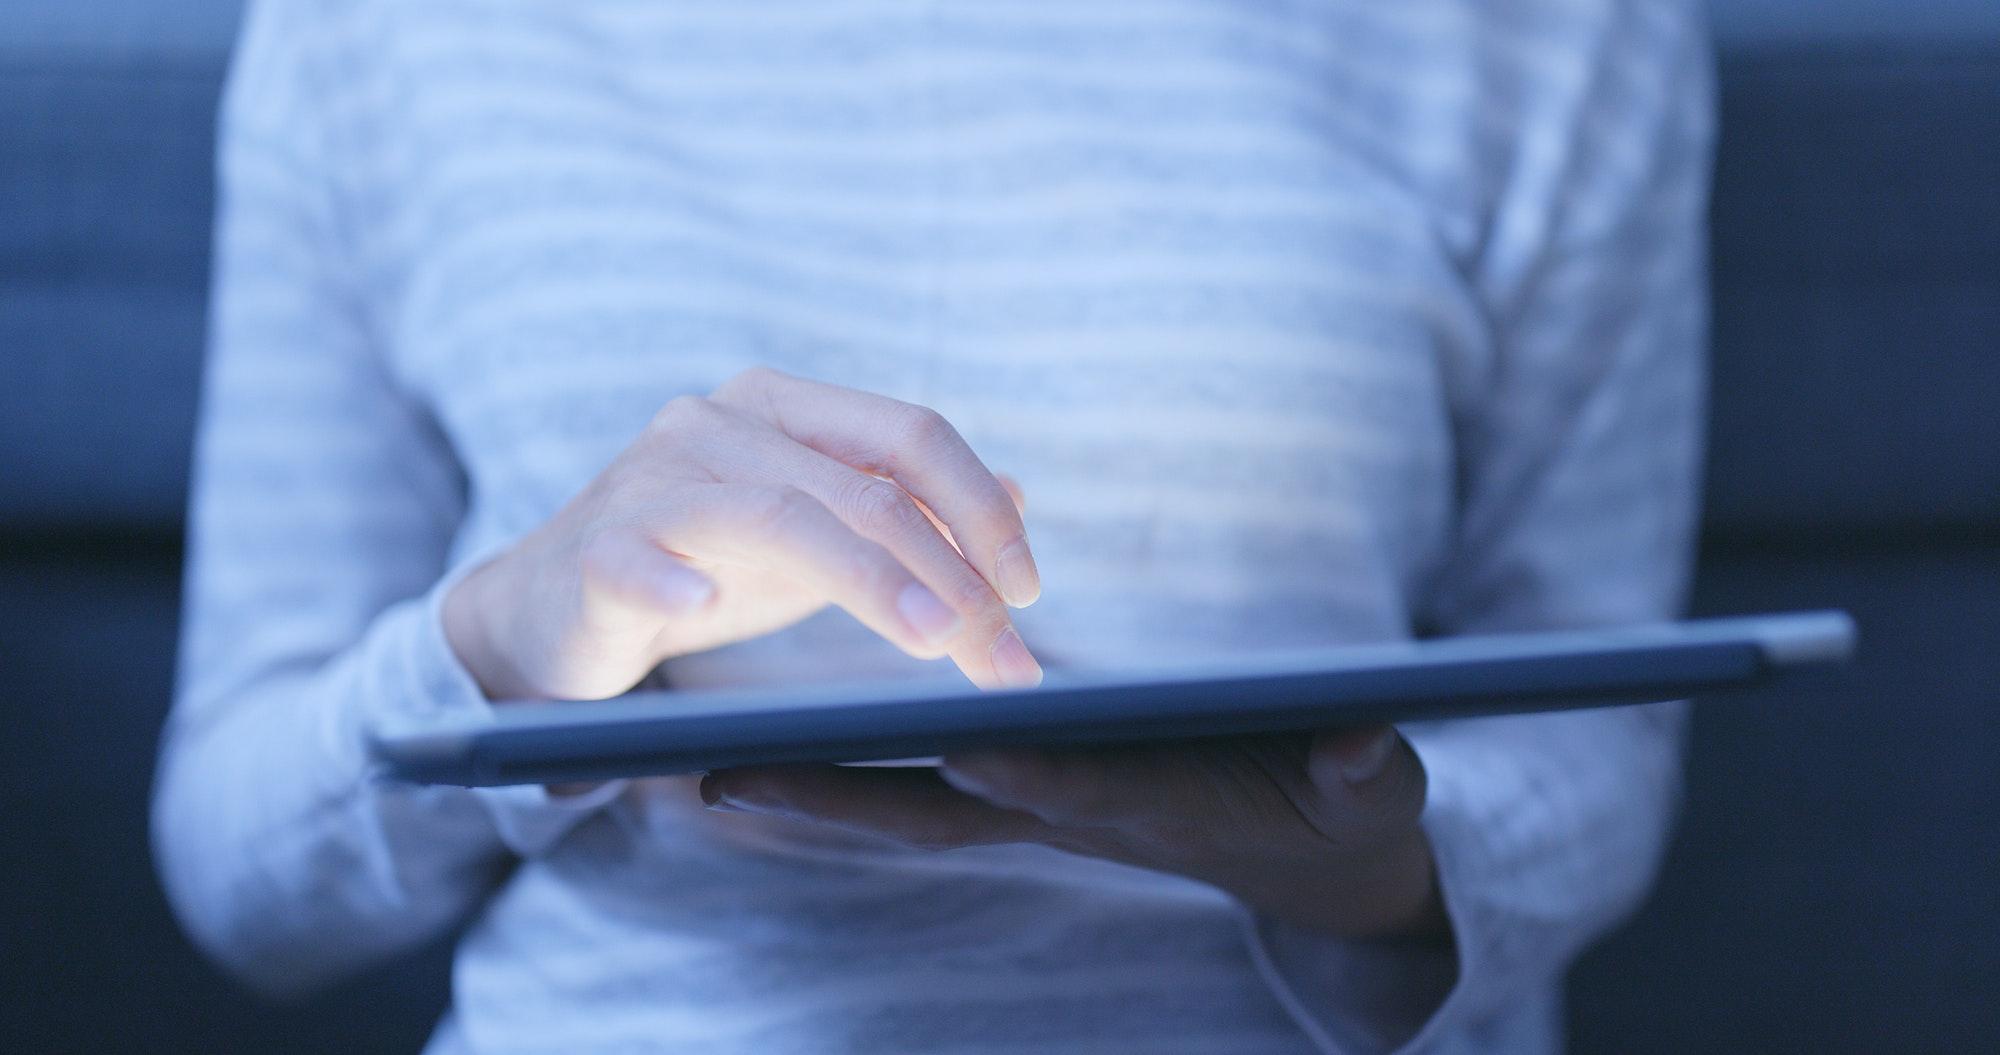 Using digital tablet computer at home